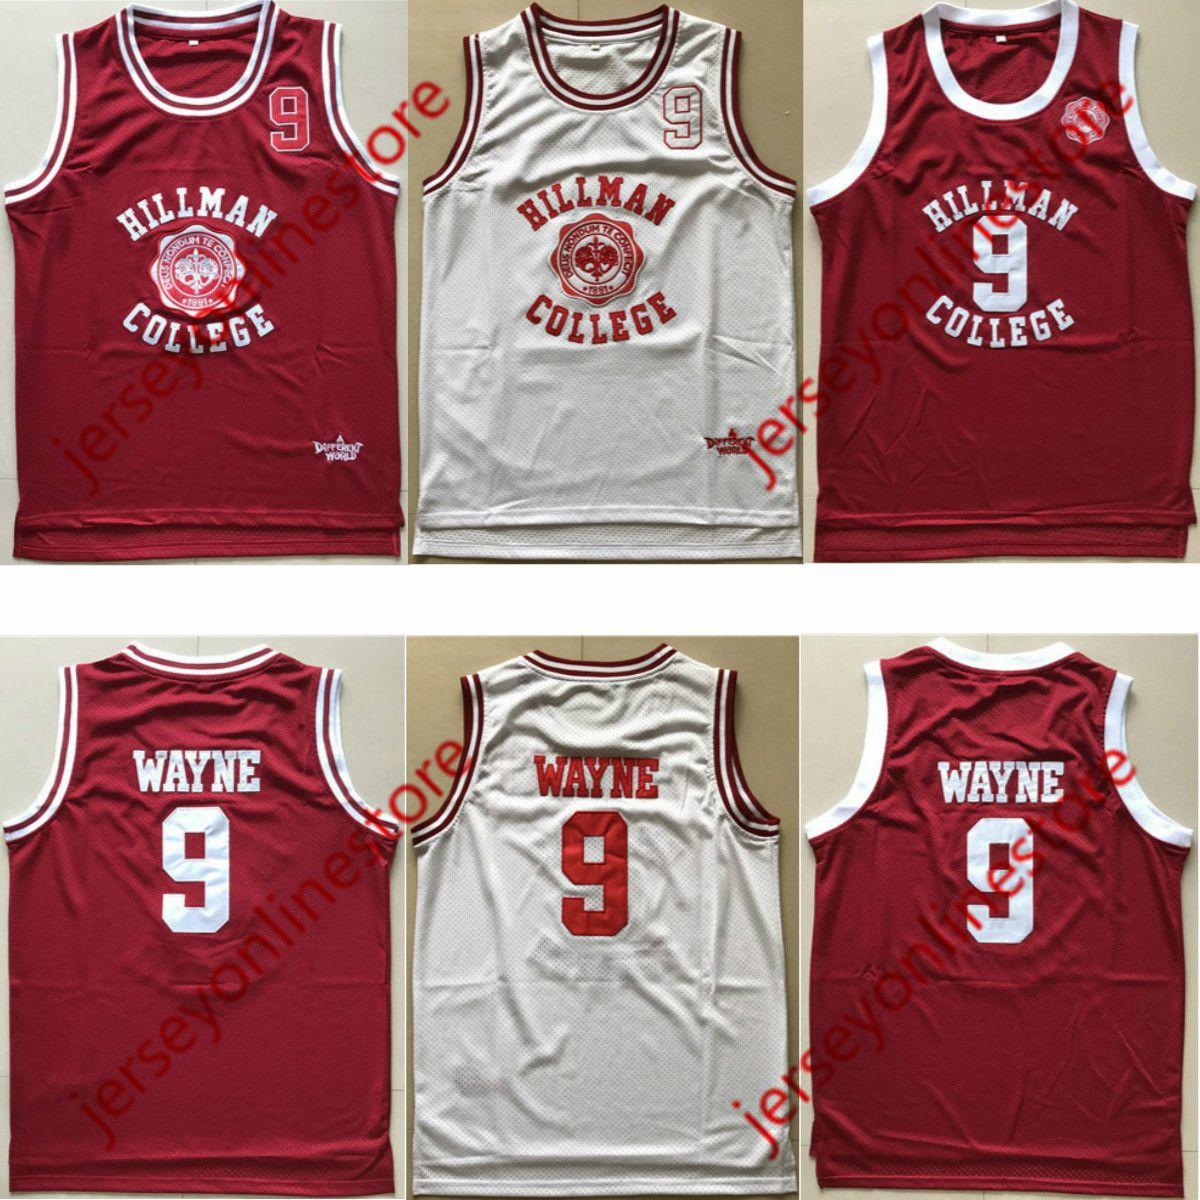 7af5c9b97f6f 2019 Men Hillman College 9  Dwayne Wayne Jersey White Red Wholesale 1881 A  Different World Movie Basketball Jerseys From Jerseyonlinestore